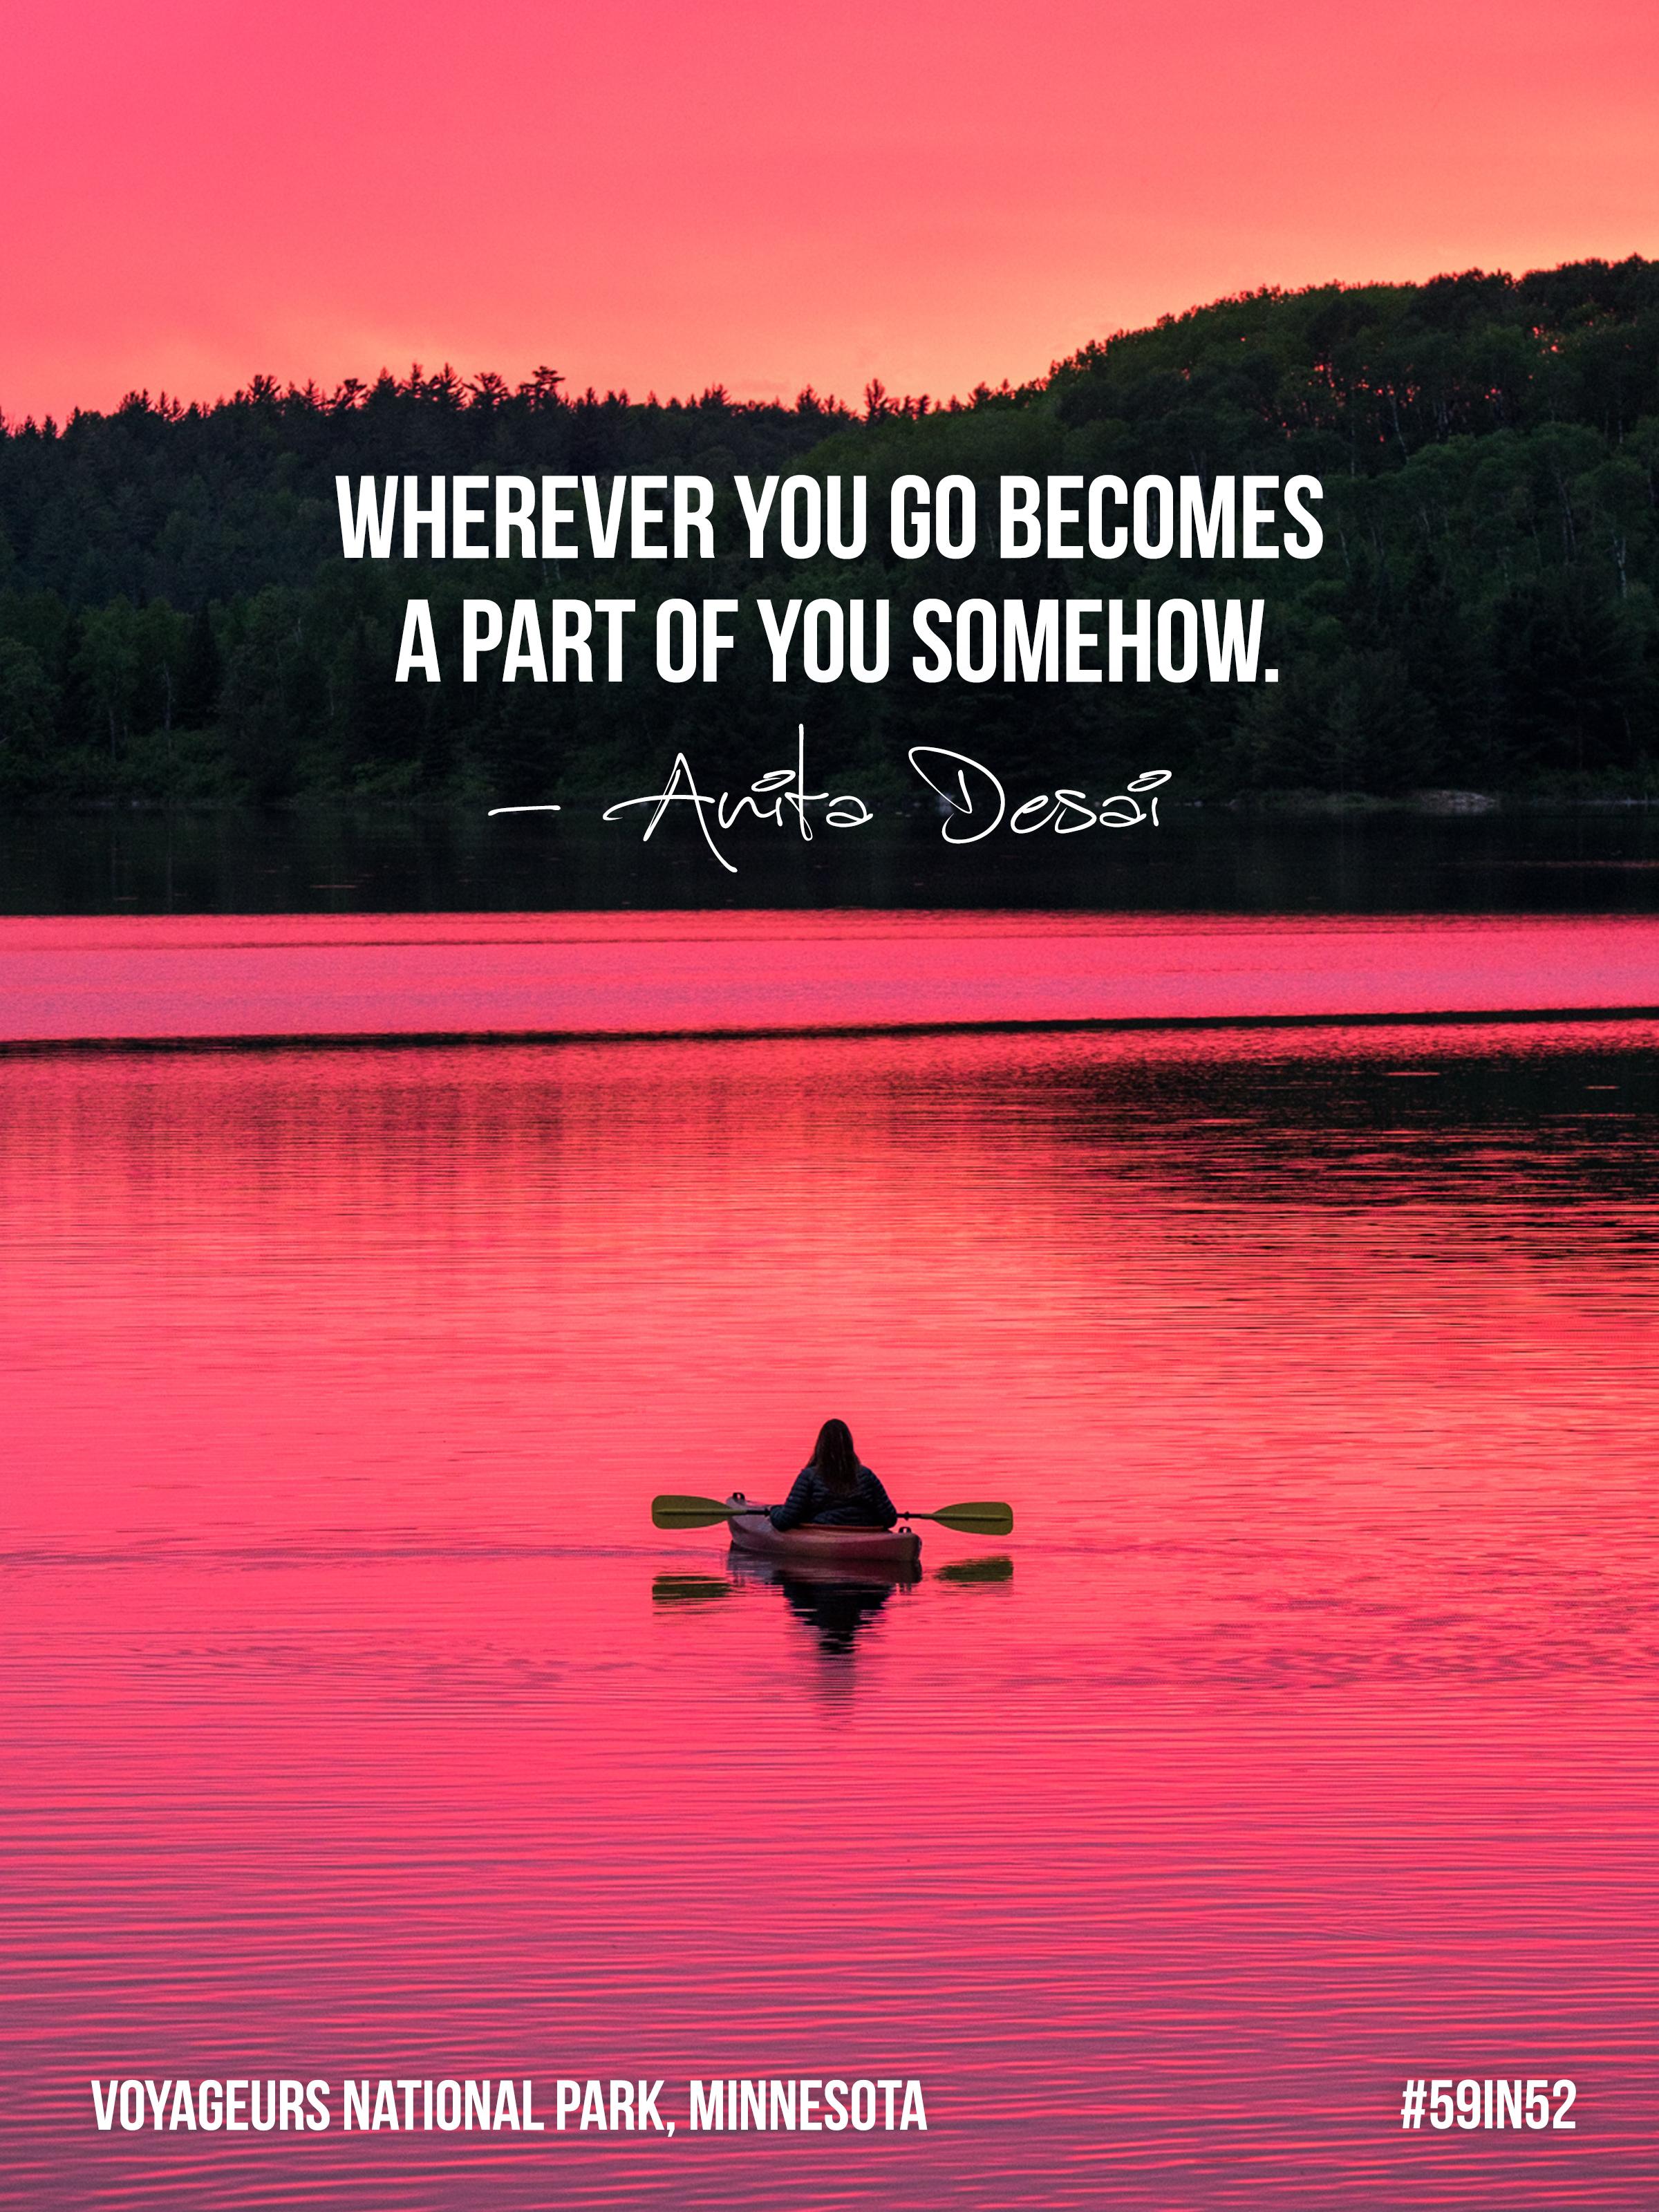 'Wherever you go becomes part of you somehow.' - Anita Desai